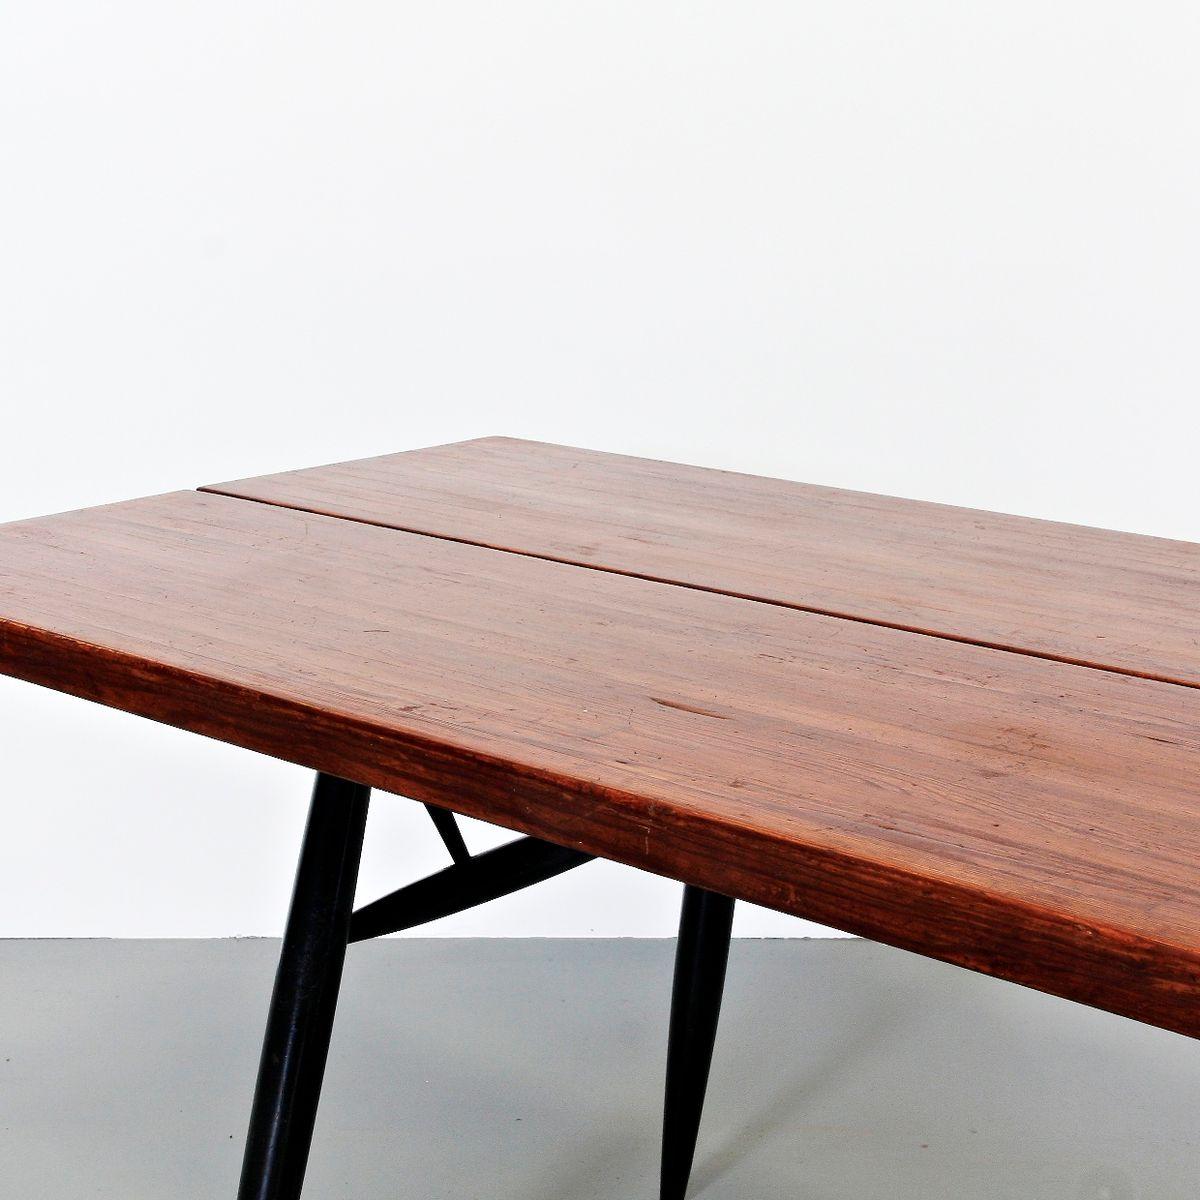 Table Top 1955: Pirkka Table By Ilmari Tapiovaara For Laukaan Puu, 1955